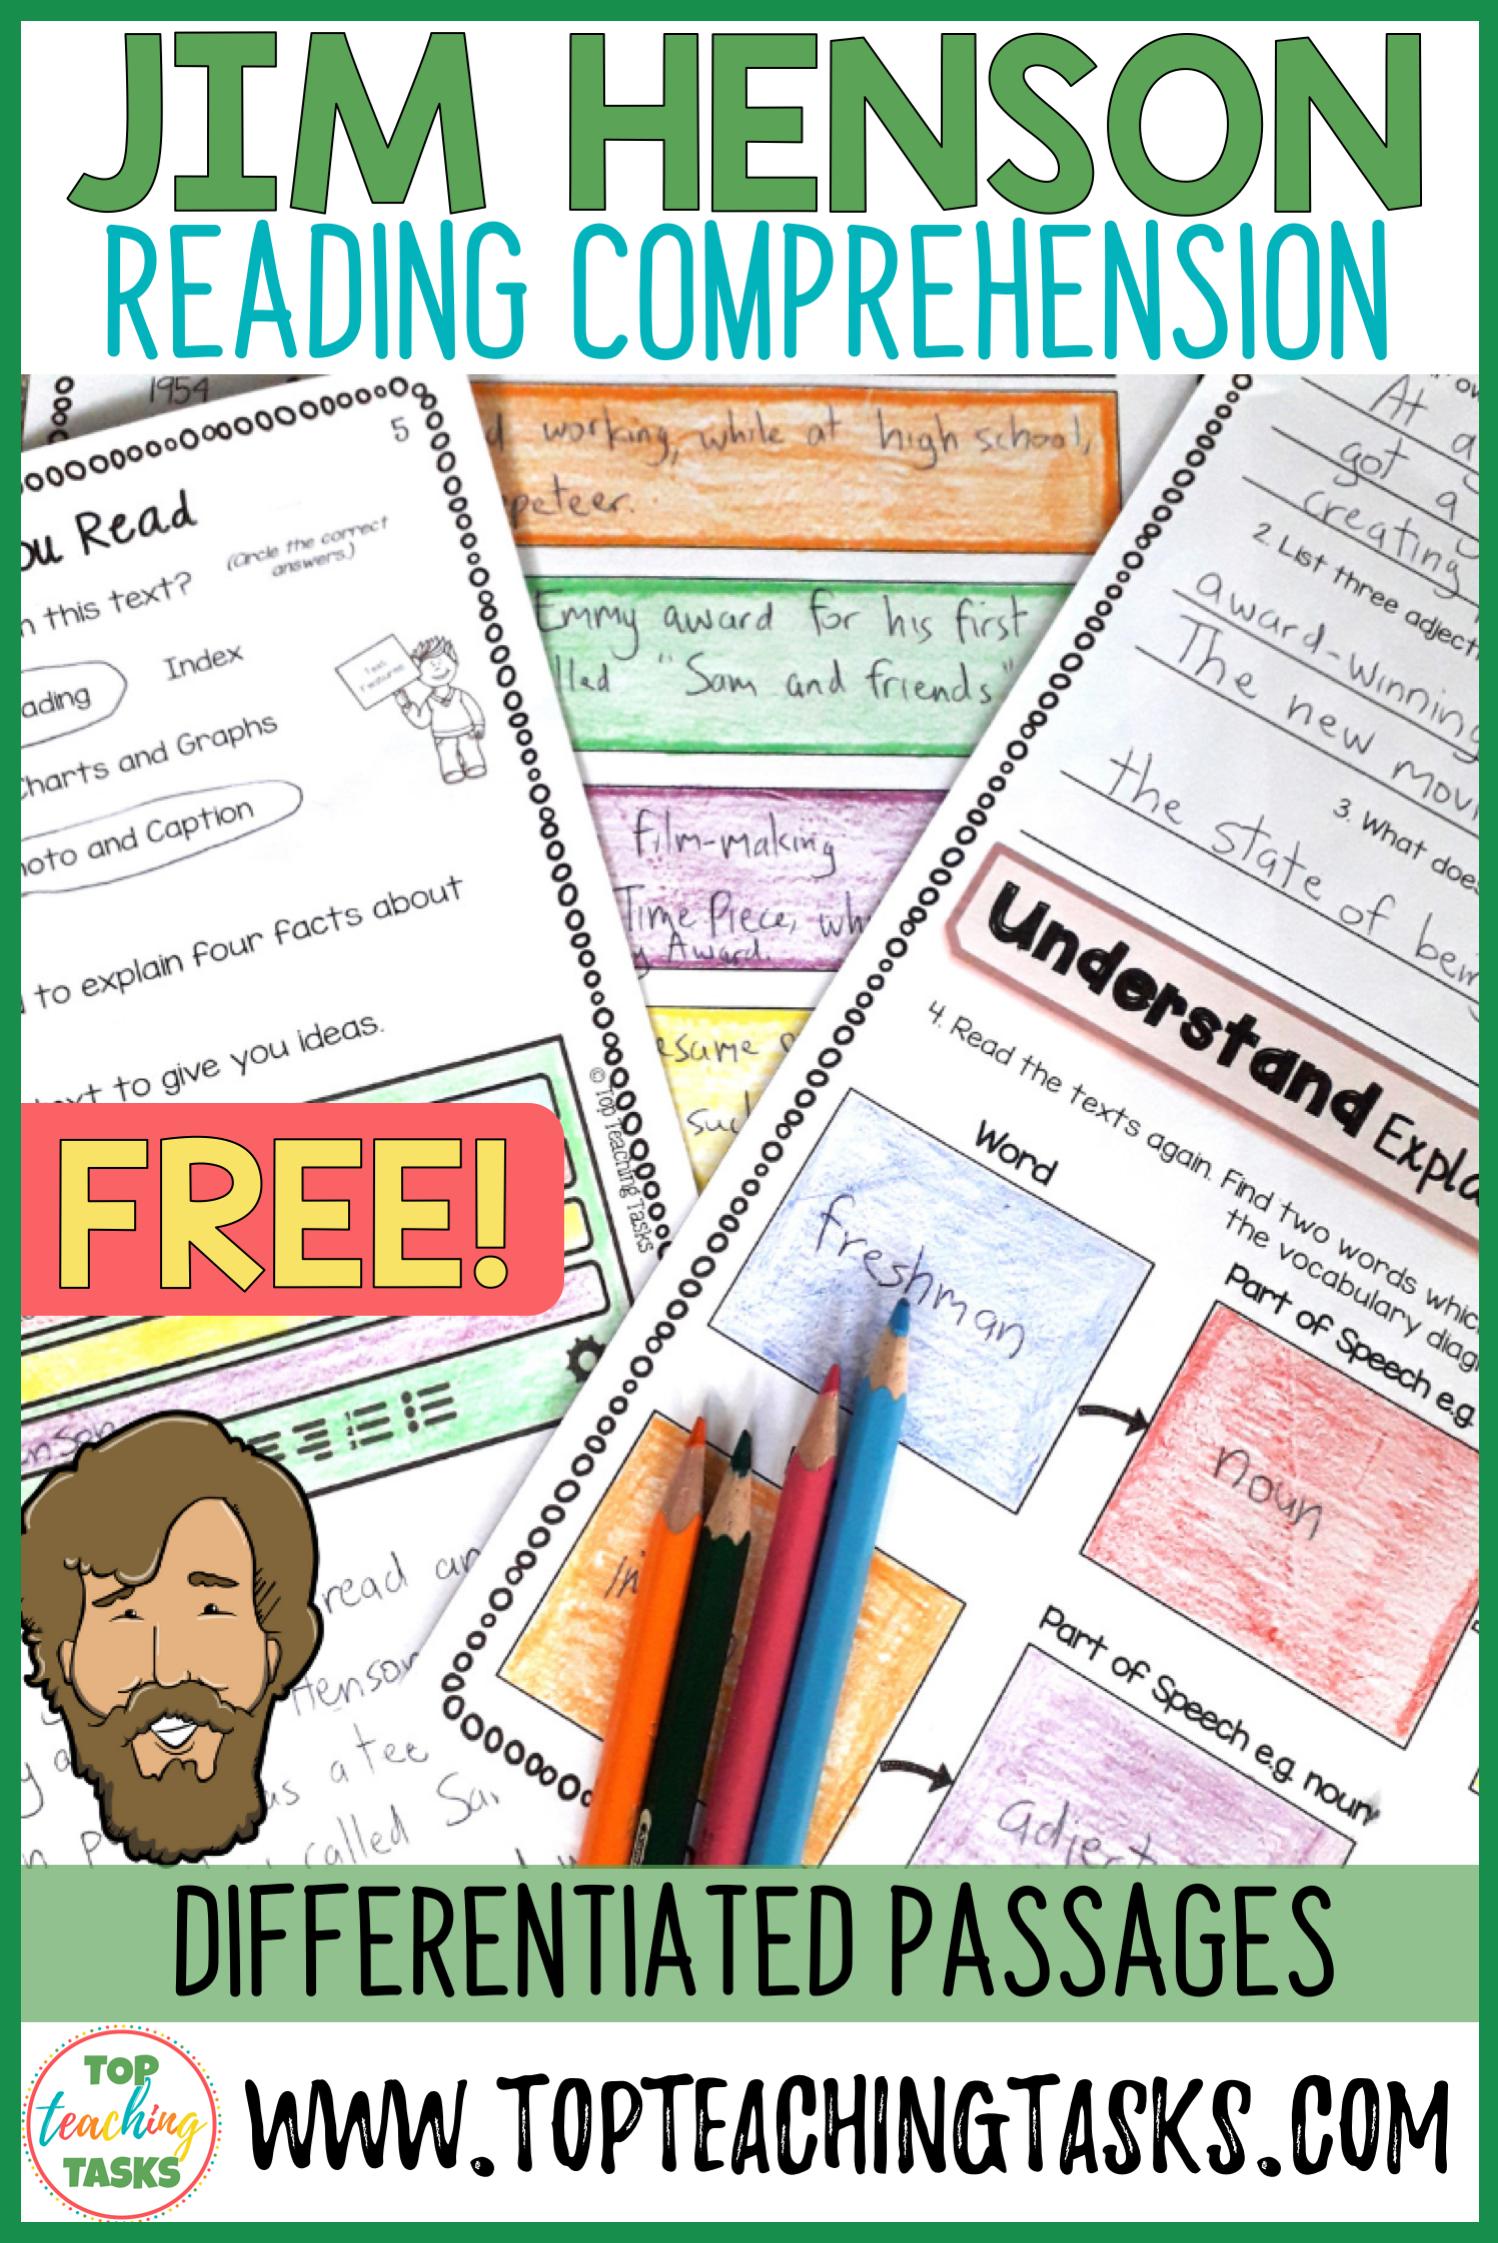 Jim Henson Reading Comprehension Activities Free Resource